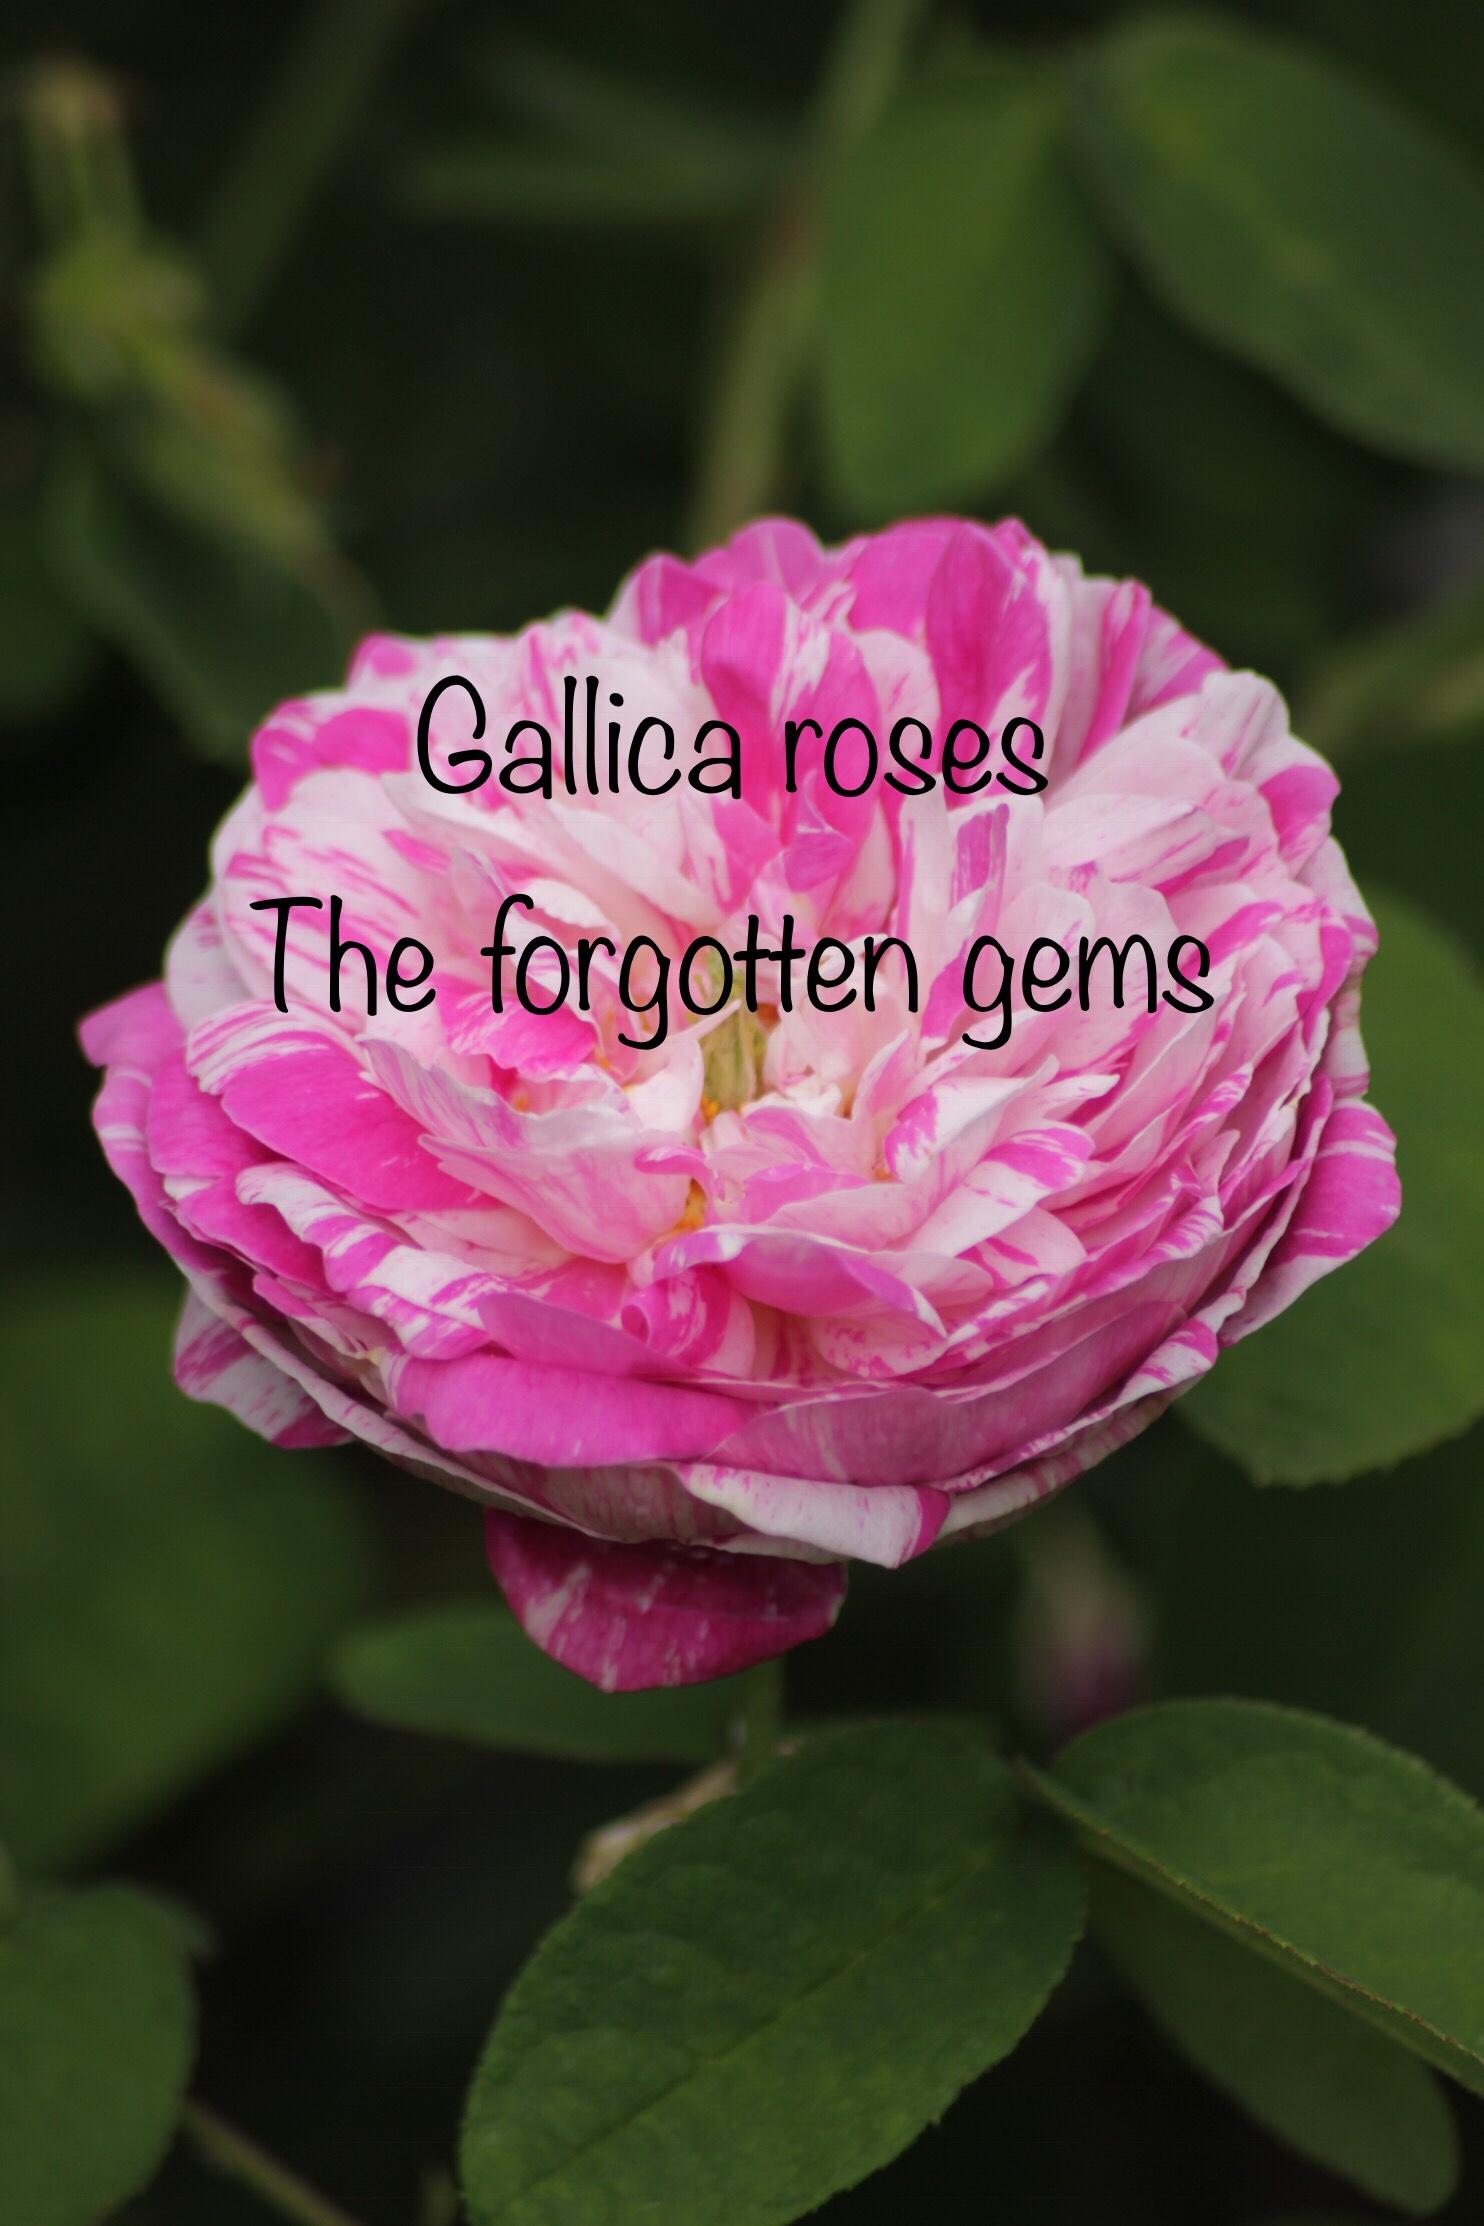 rosa camuyeux 1 Gallica roses, forgotten gems